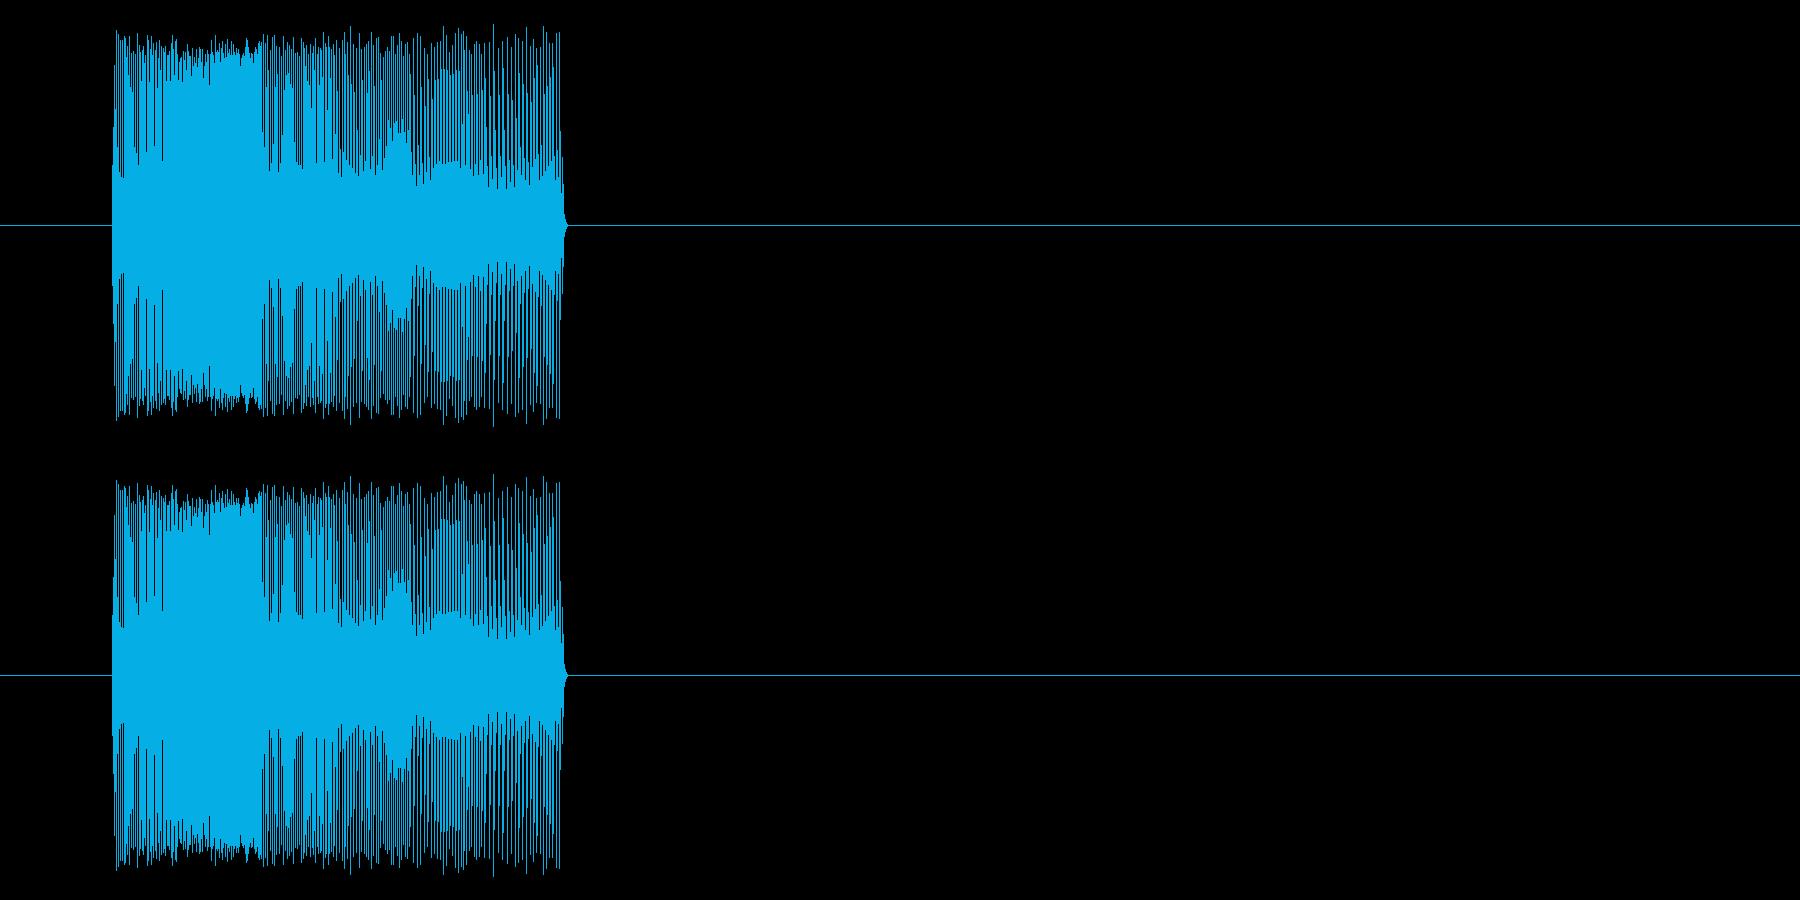 【NES RPG03-08(魔法 状態)の再生済みの波形